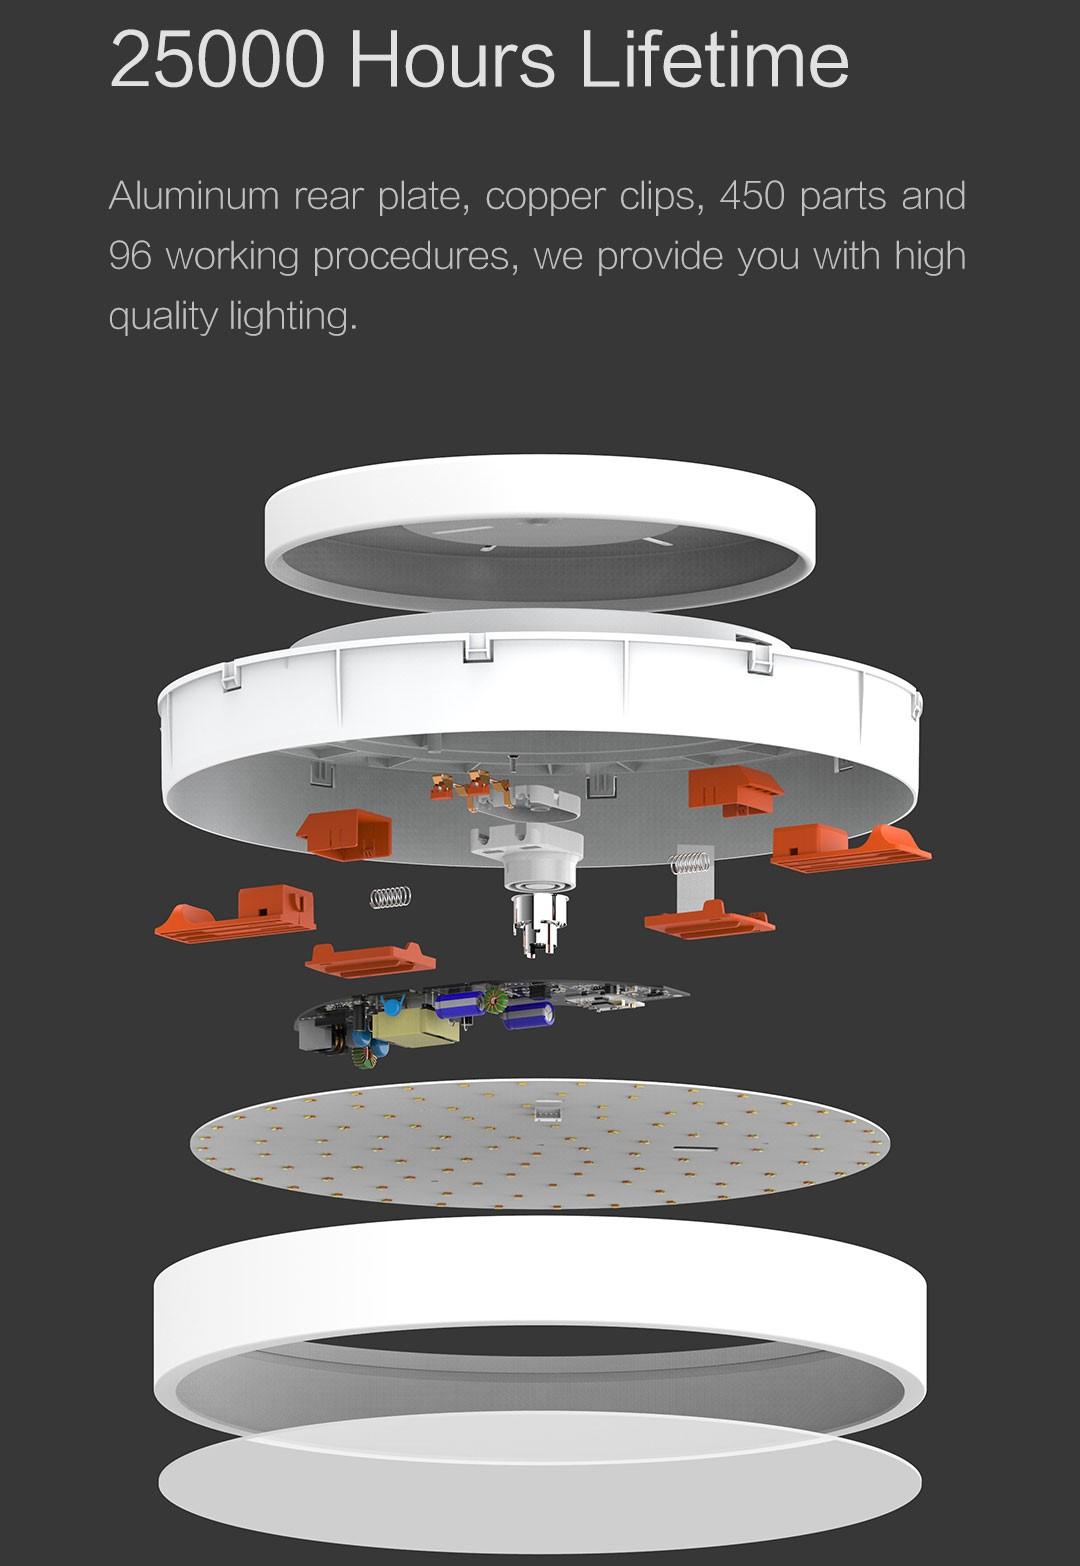 Đèn ốp trần Yeelight 320 Pro